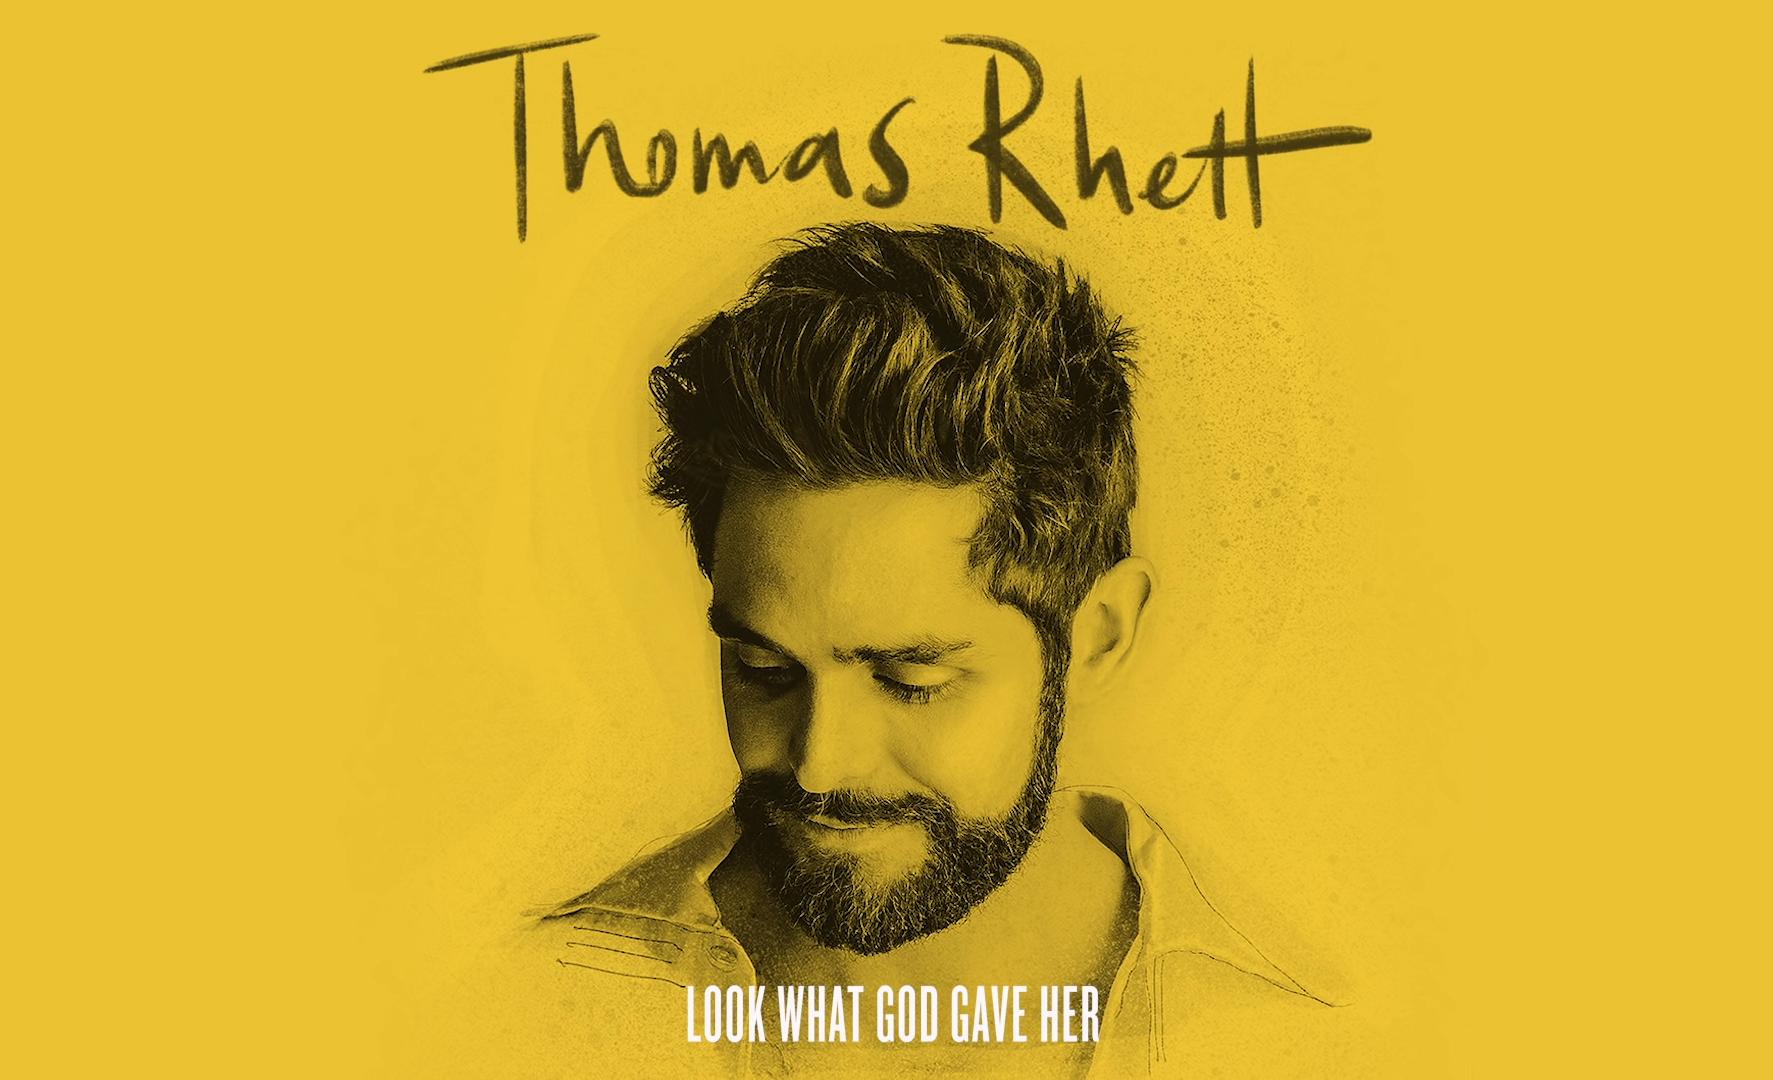 Here it is! [LISTEN] Thomas Rhett's New Single